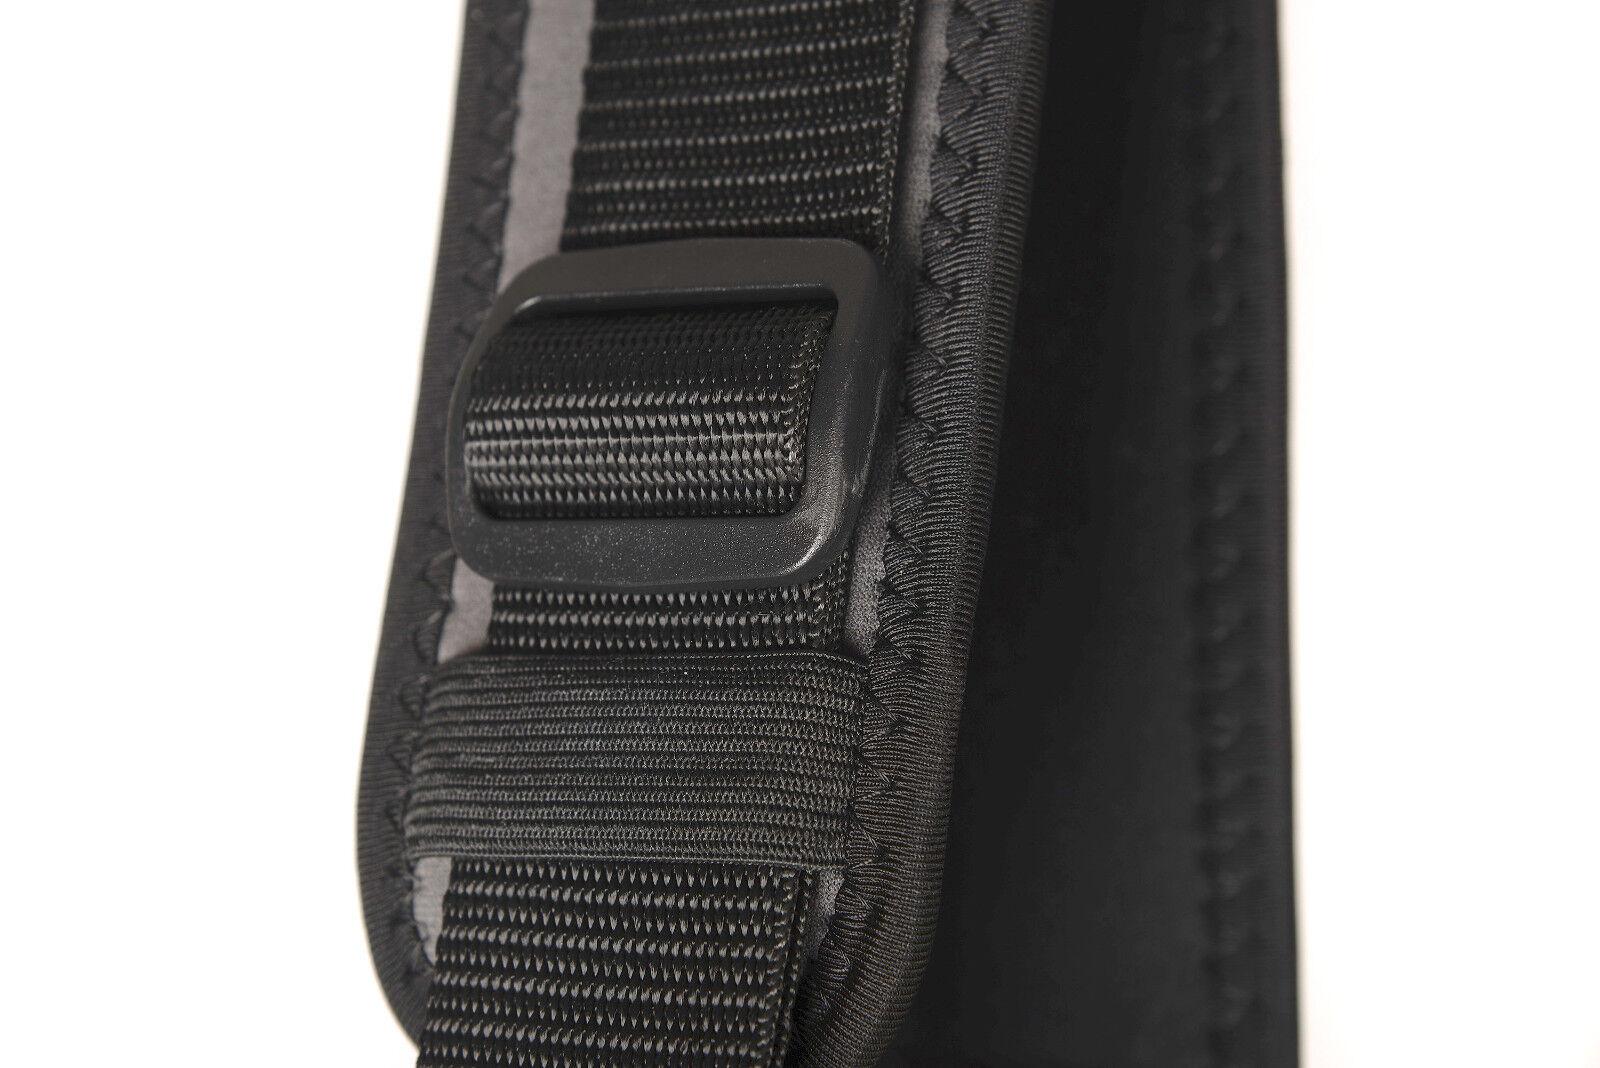 Spro 5mm Neopren Neopren Neopren Wathose Größe: 44 Neoprene Chest Wader Rubber Stiefel 3c28f2